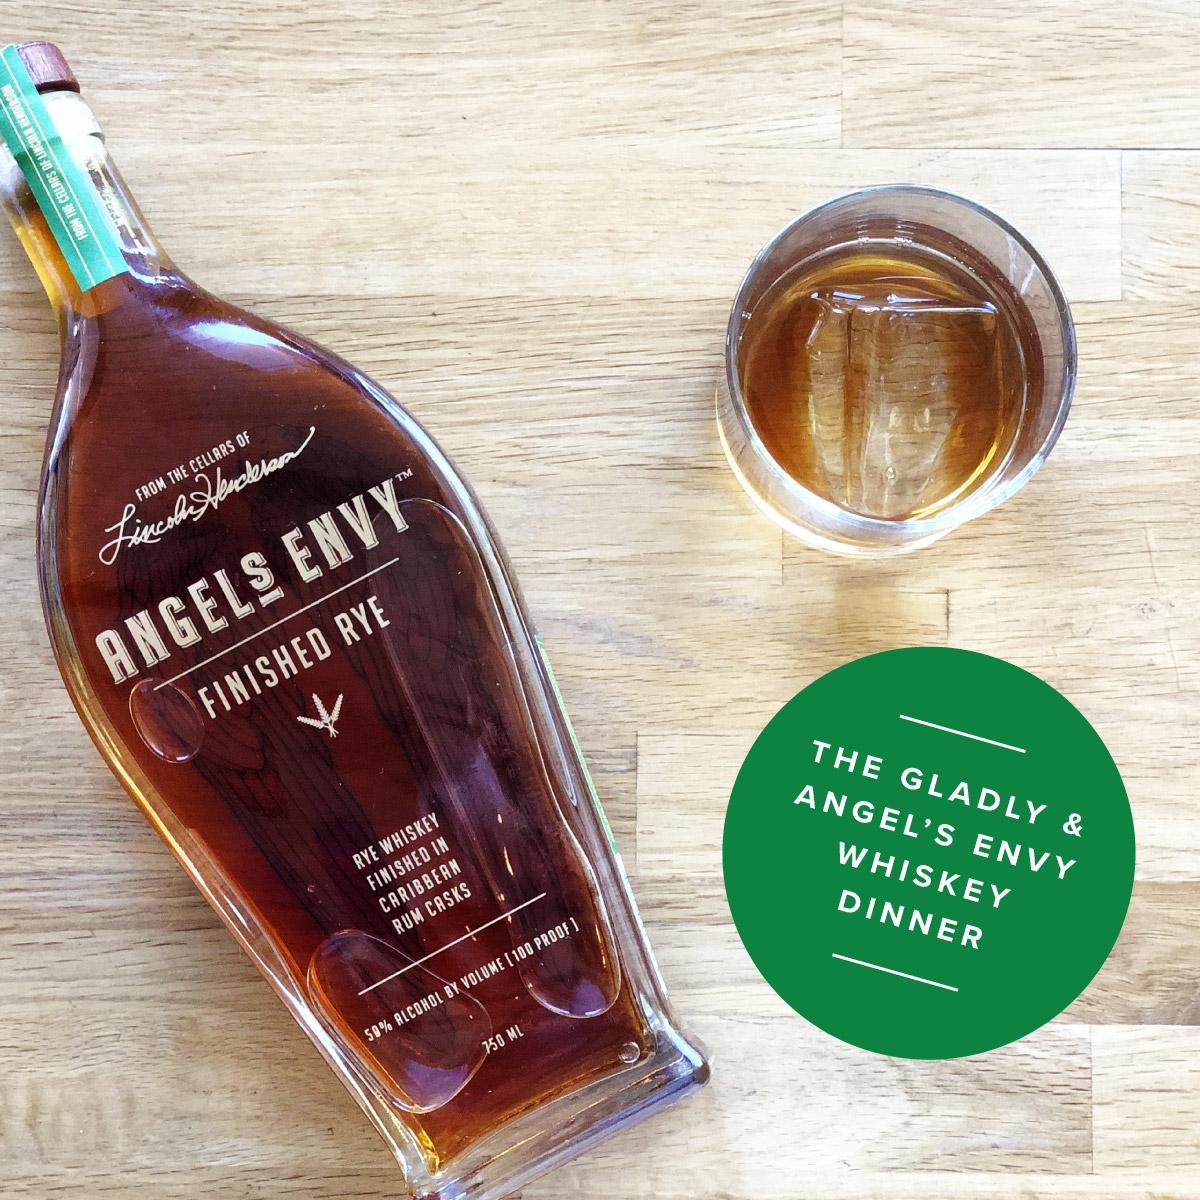 The Gladly's Angel Envy Whiskey Dinner